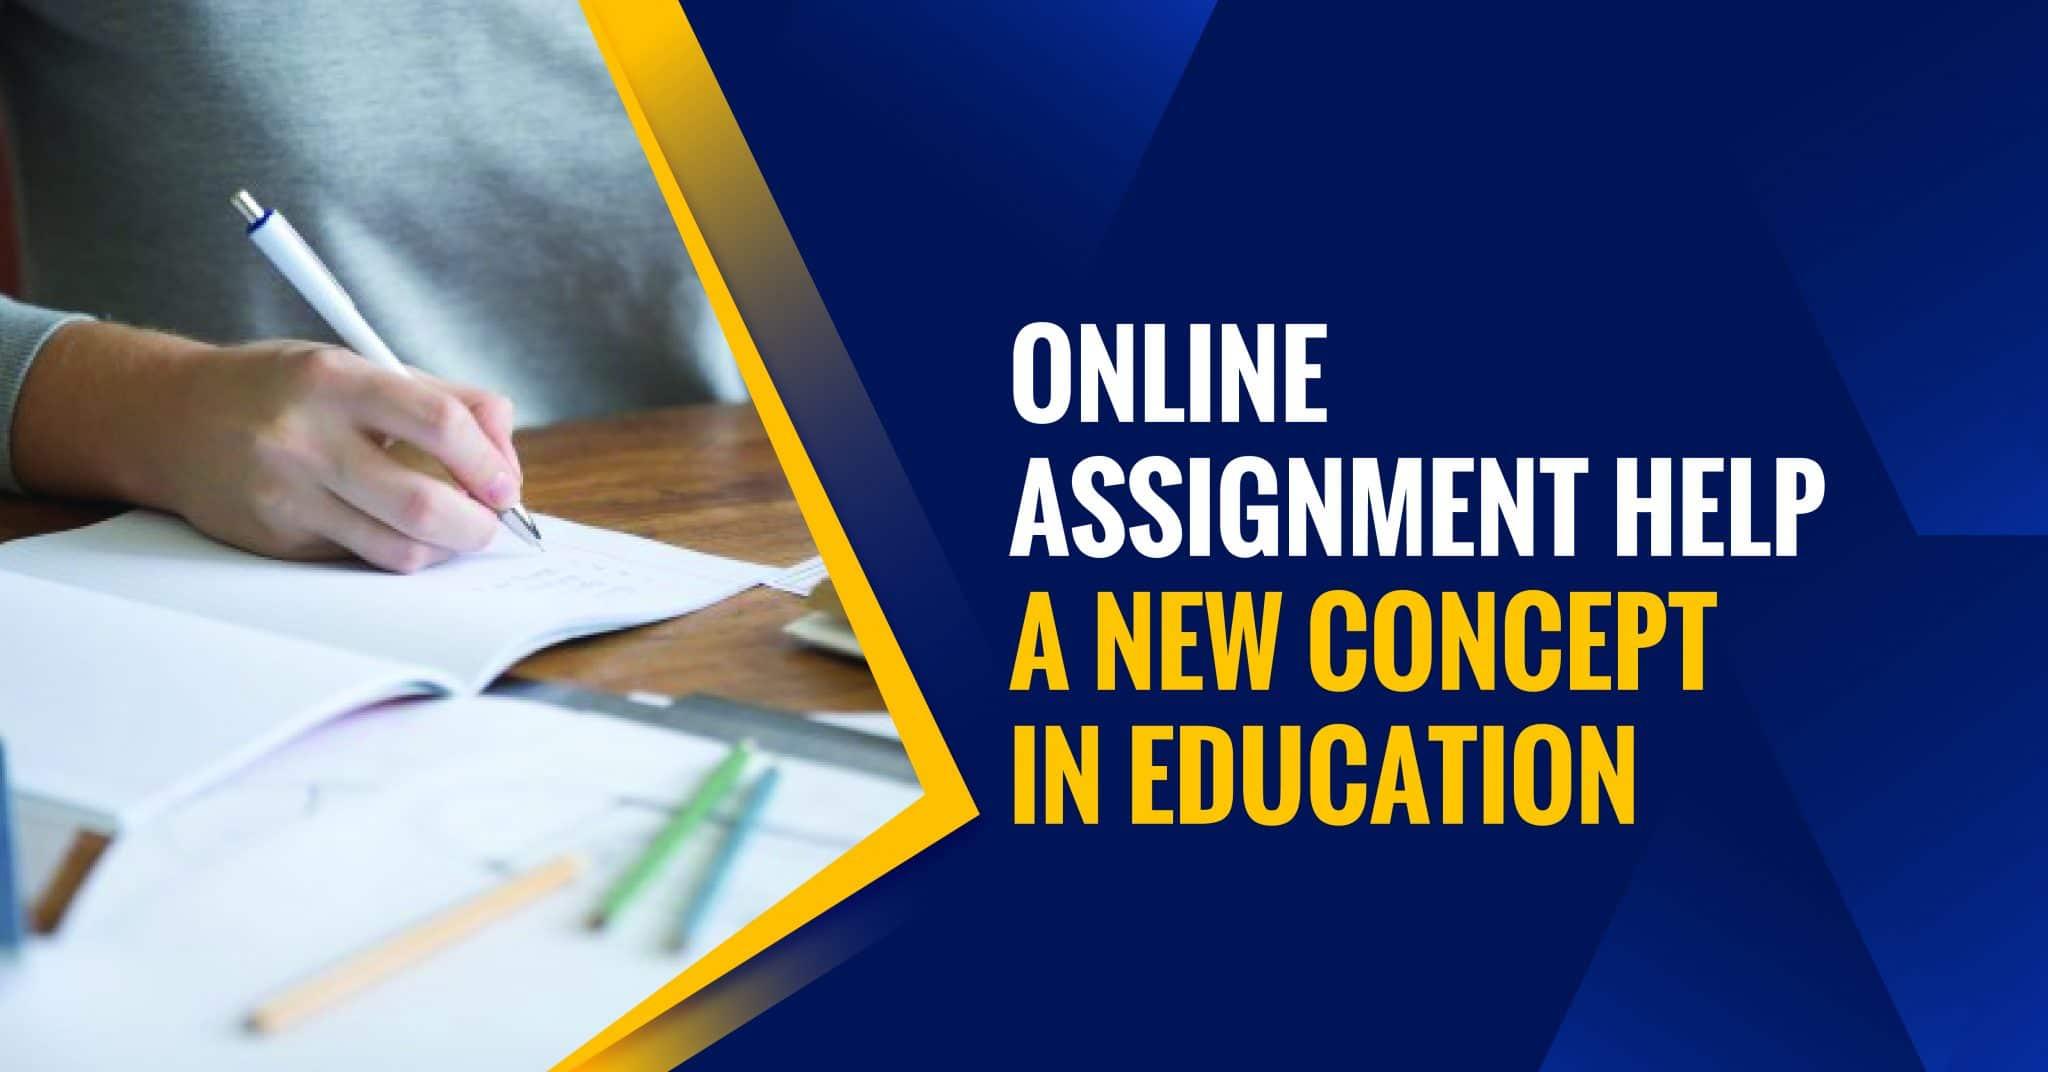 Online Assignment Help